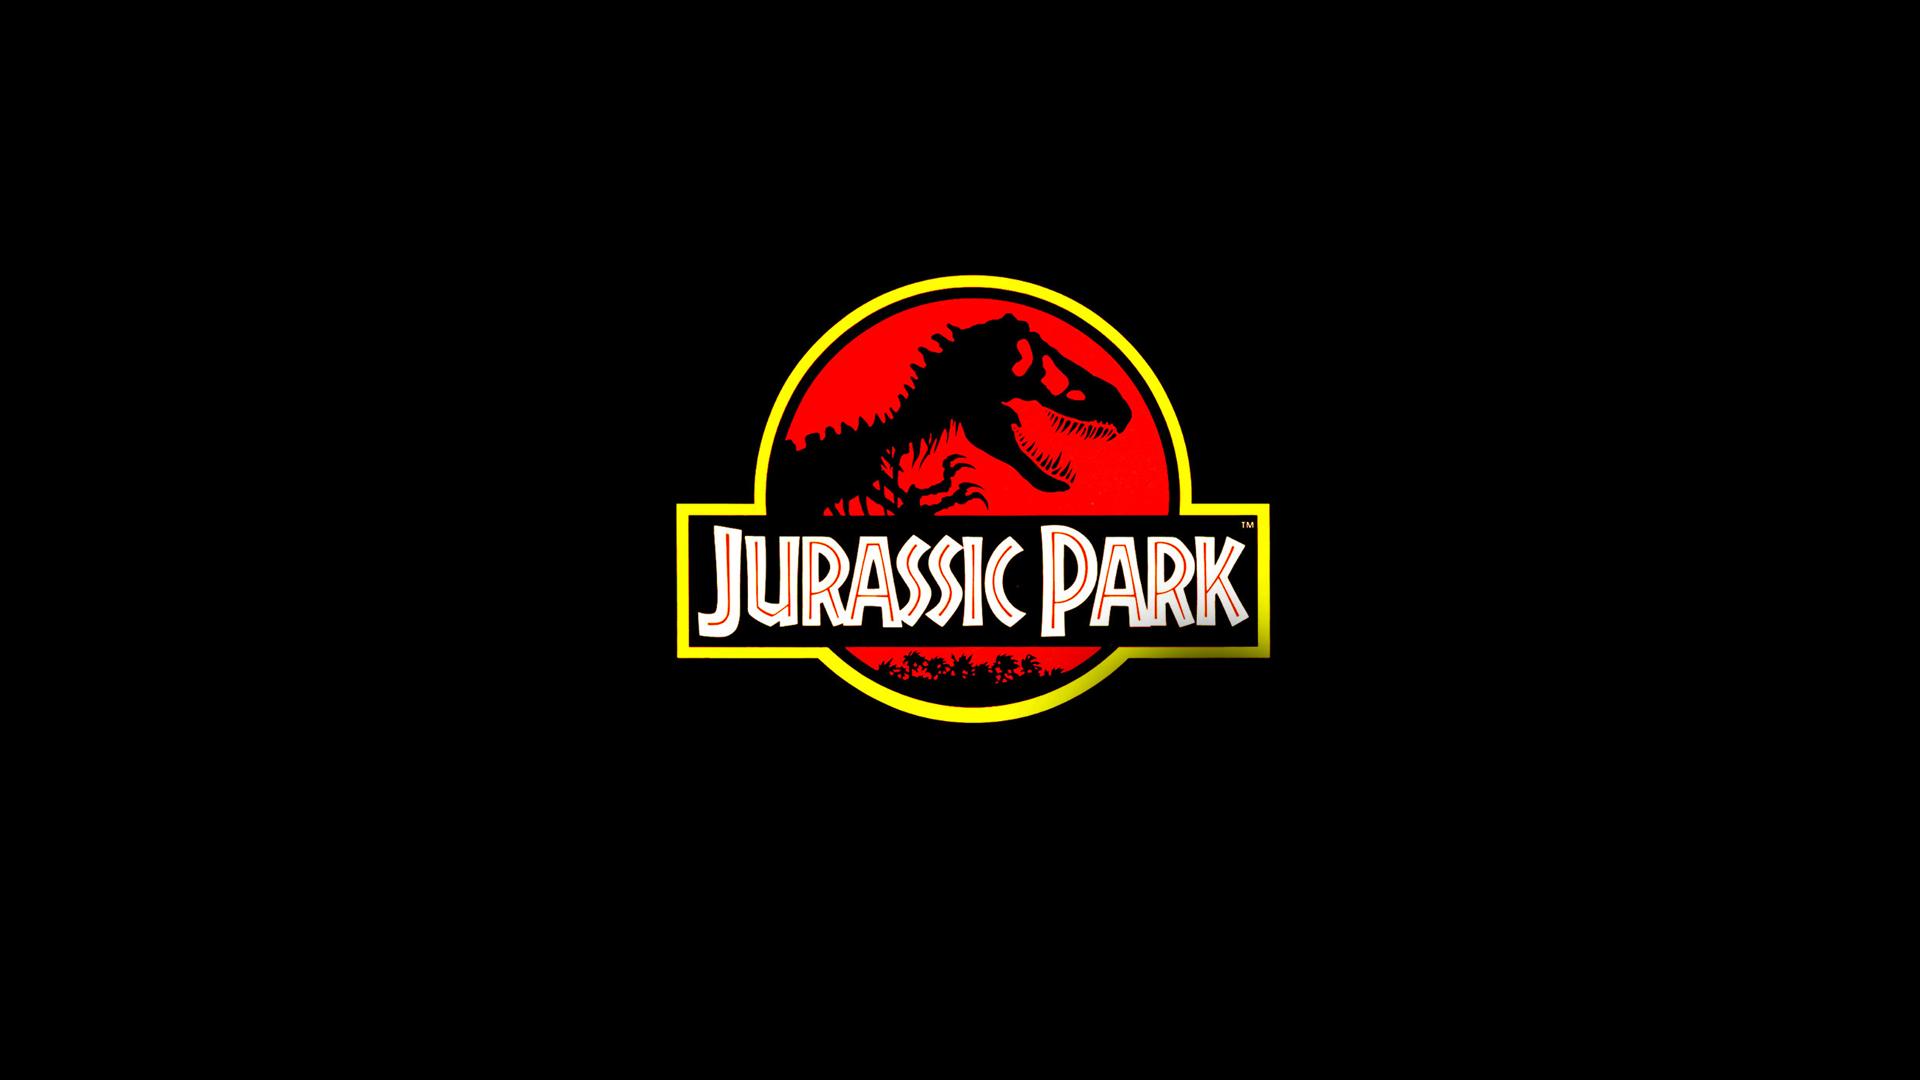 Télécharger photo jurassic park logo hd png